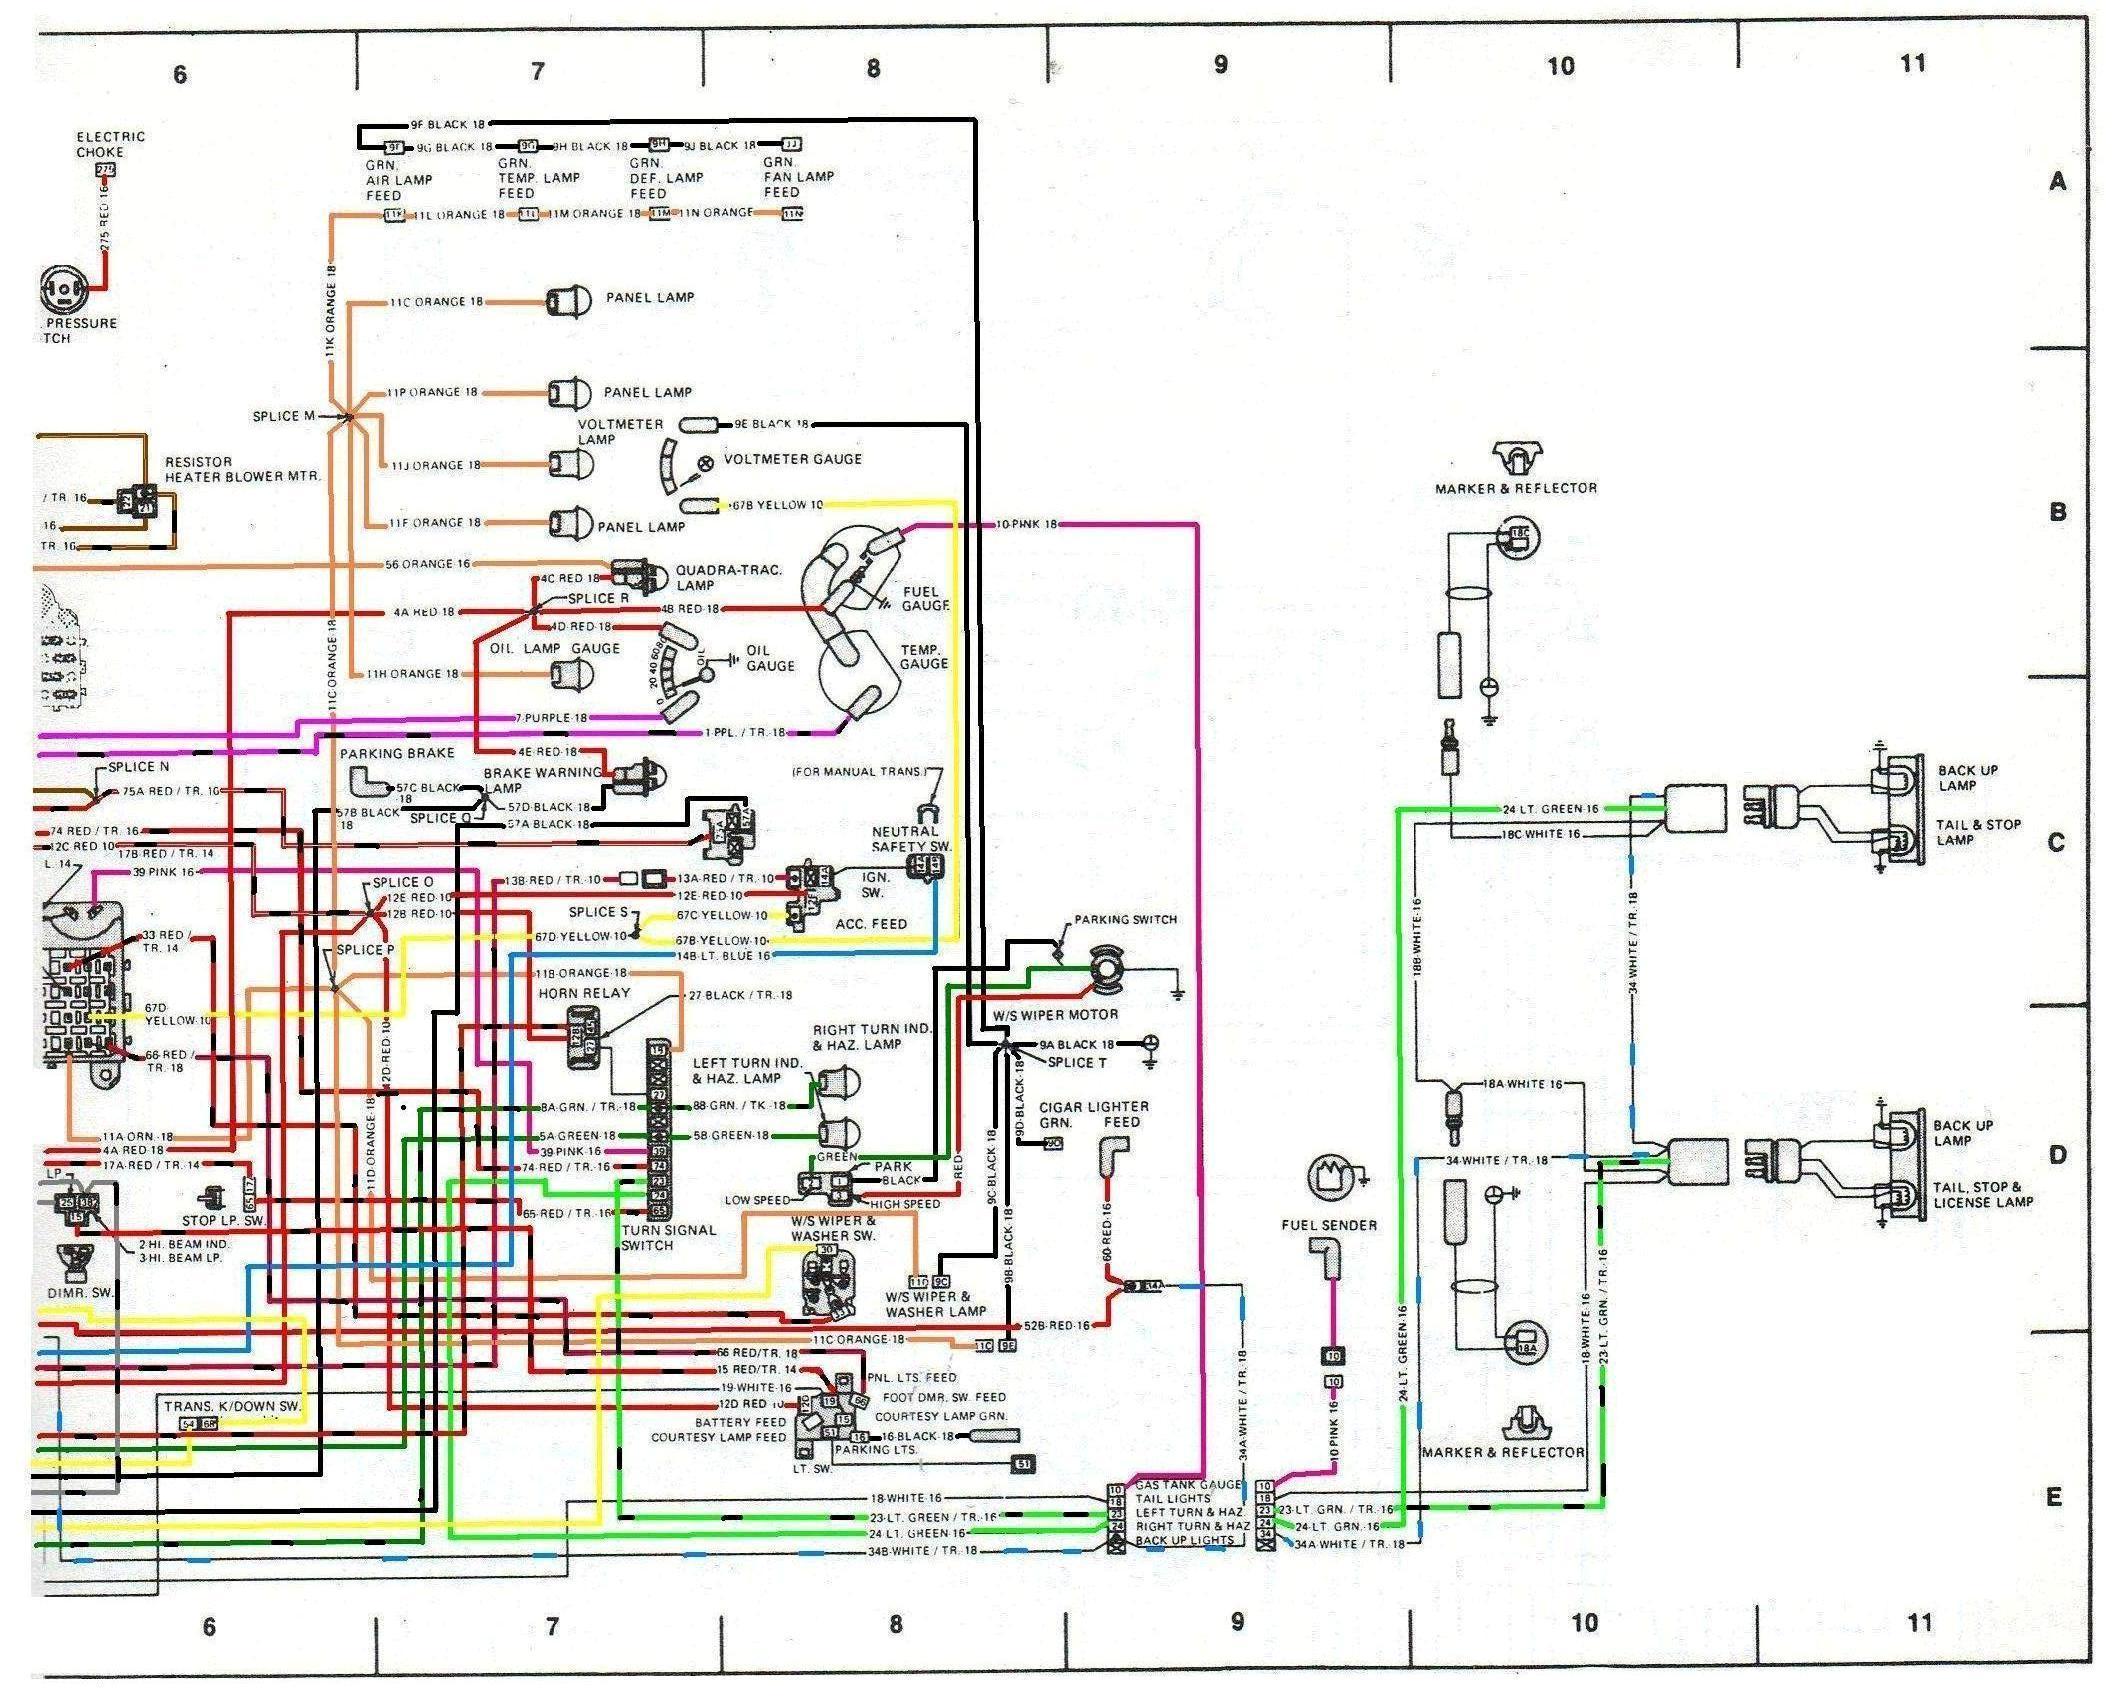 Swell Jeep Fuel Gauge Wiring Diagram Basic Electronics Wiring Diagram Wiring Cloud Ittabisraaidewilluminateatxorg